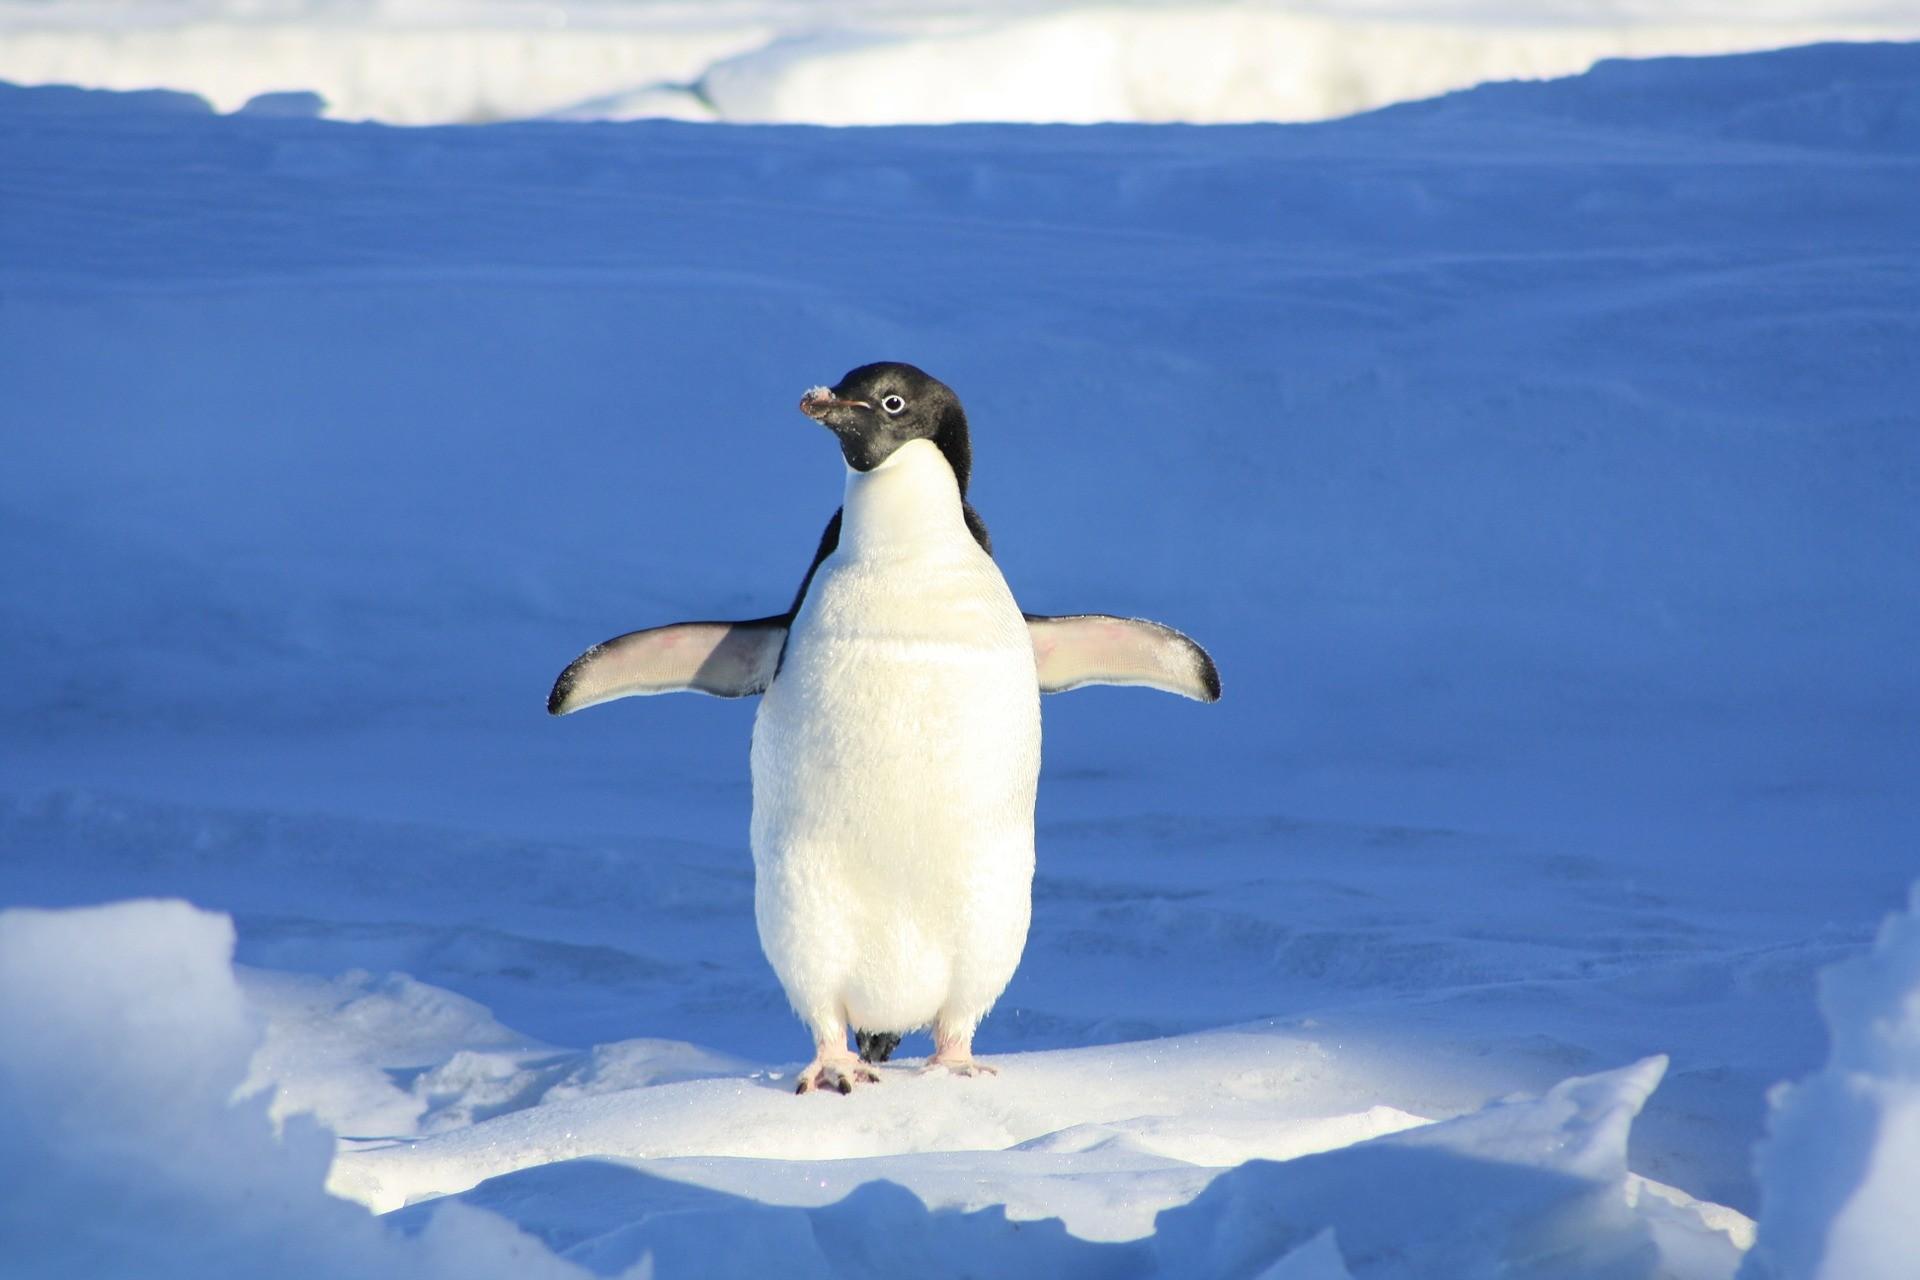 15514712491693656_by_hans3595_penguin-56101_1920